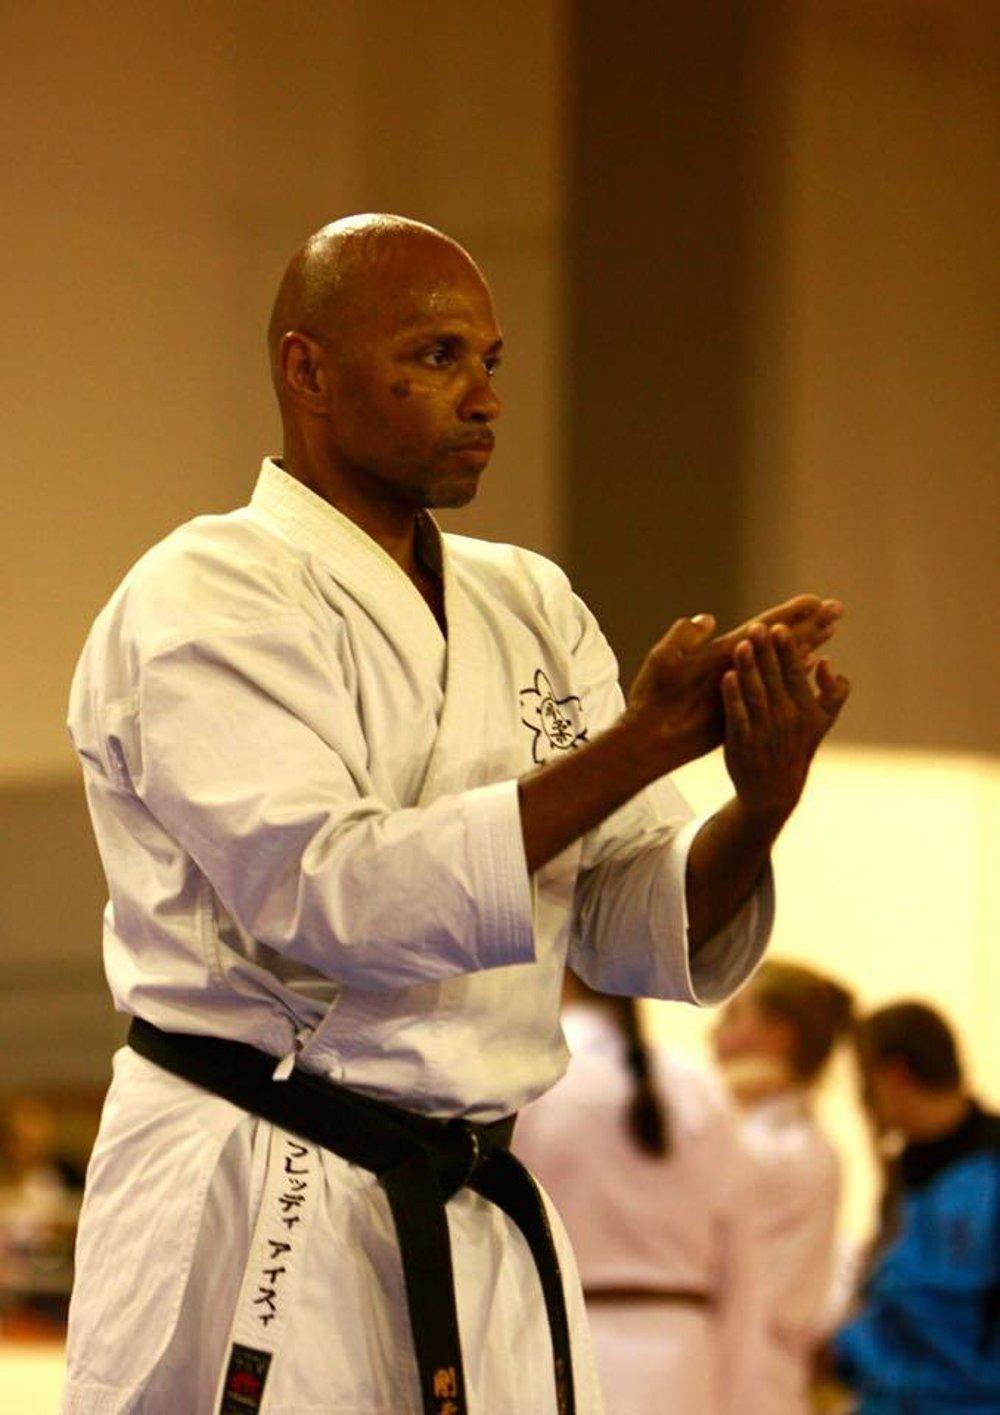 https://karate-slovakia.sk/wp-content/uploads/fredy6.jpeg